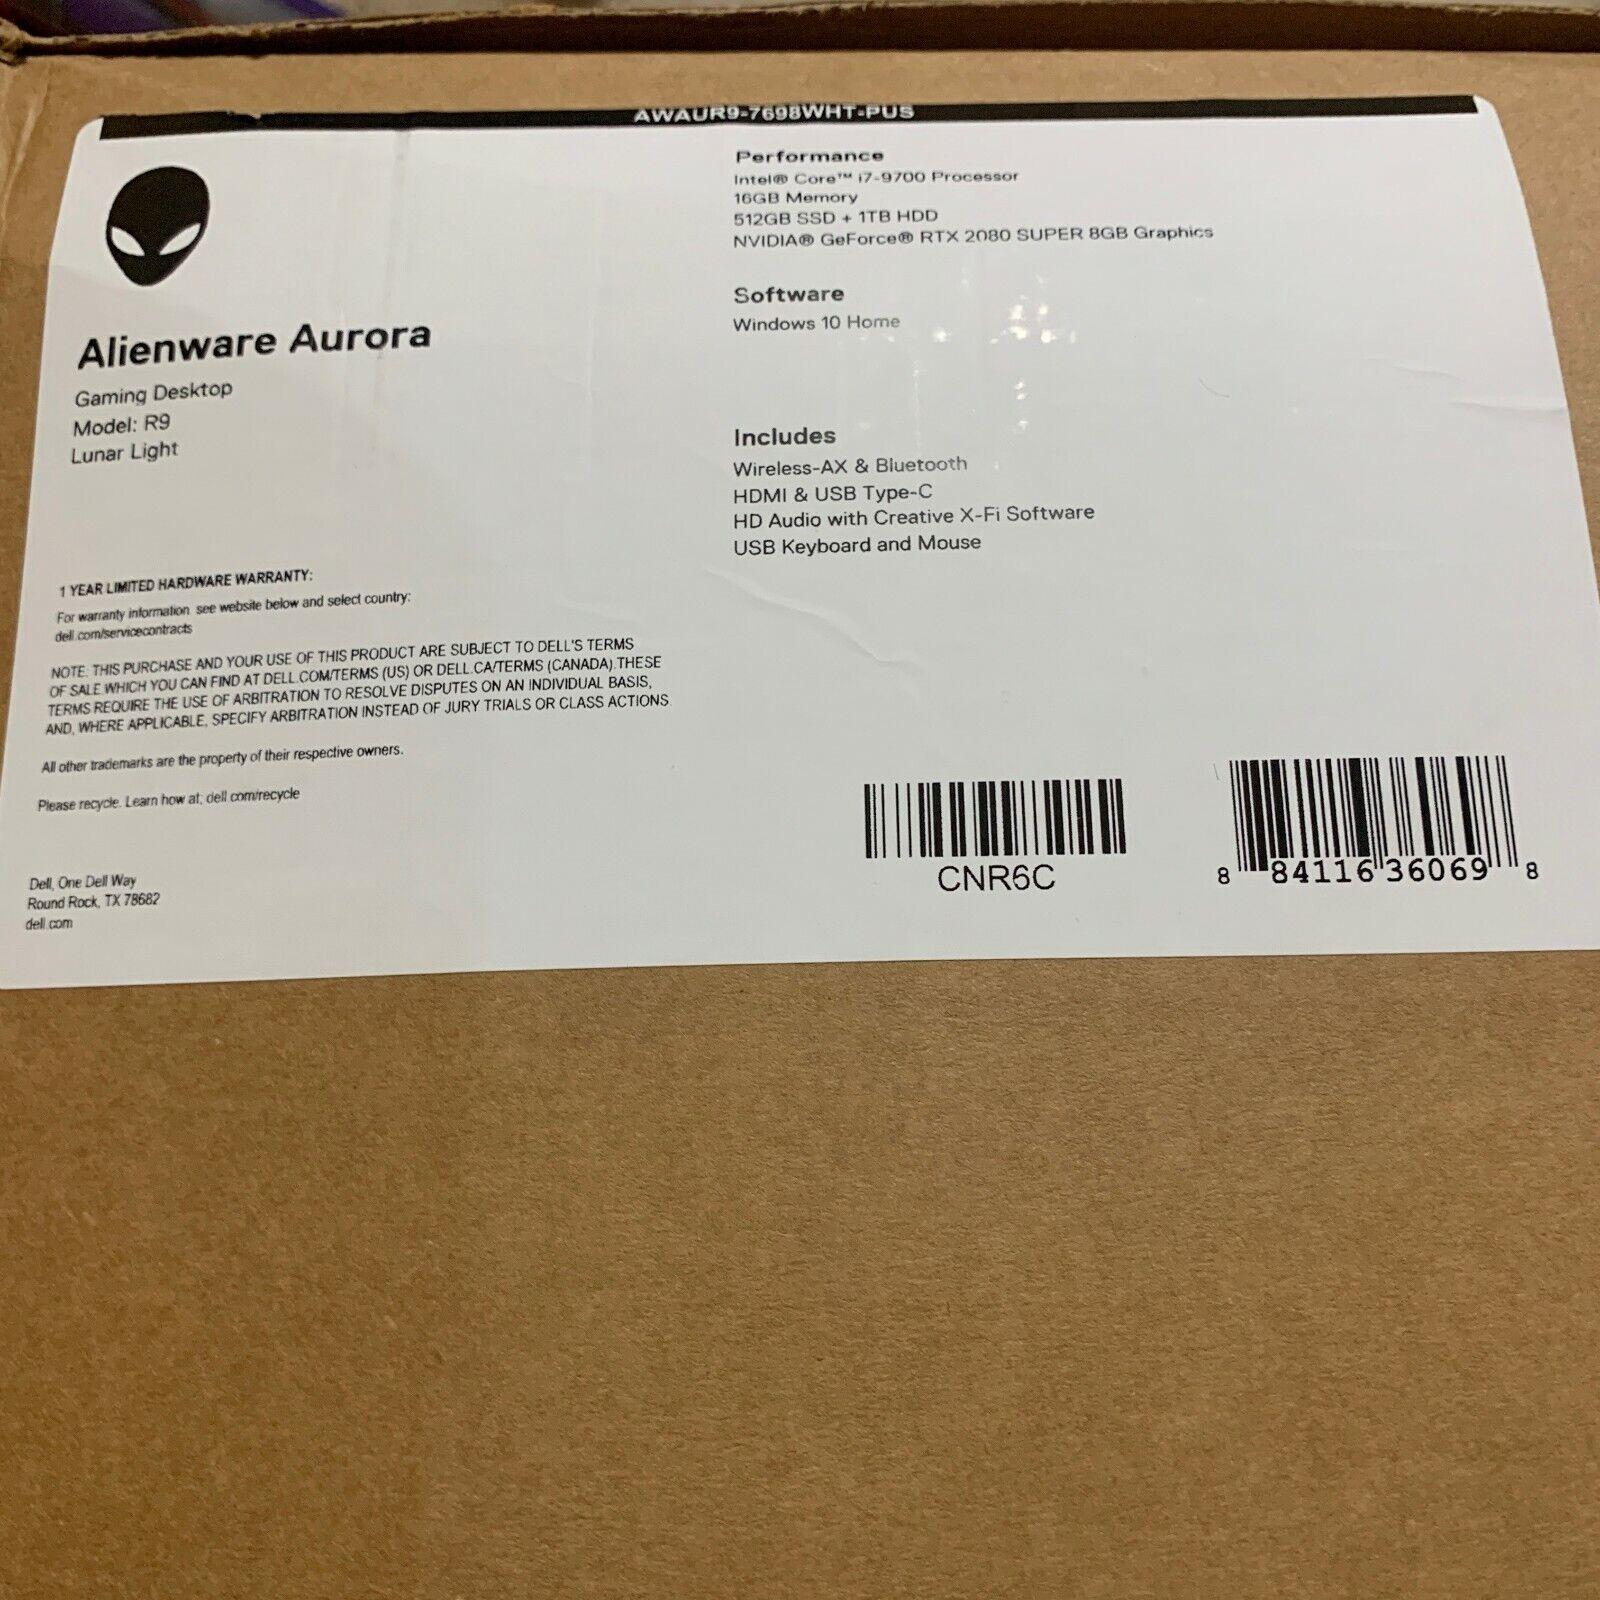 Alienware - Aurora R9 Gaming Desktop - Intel Core i7-9700 -